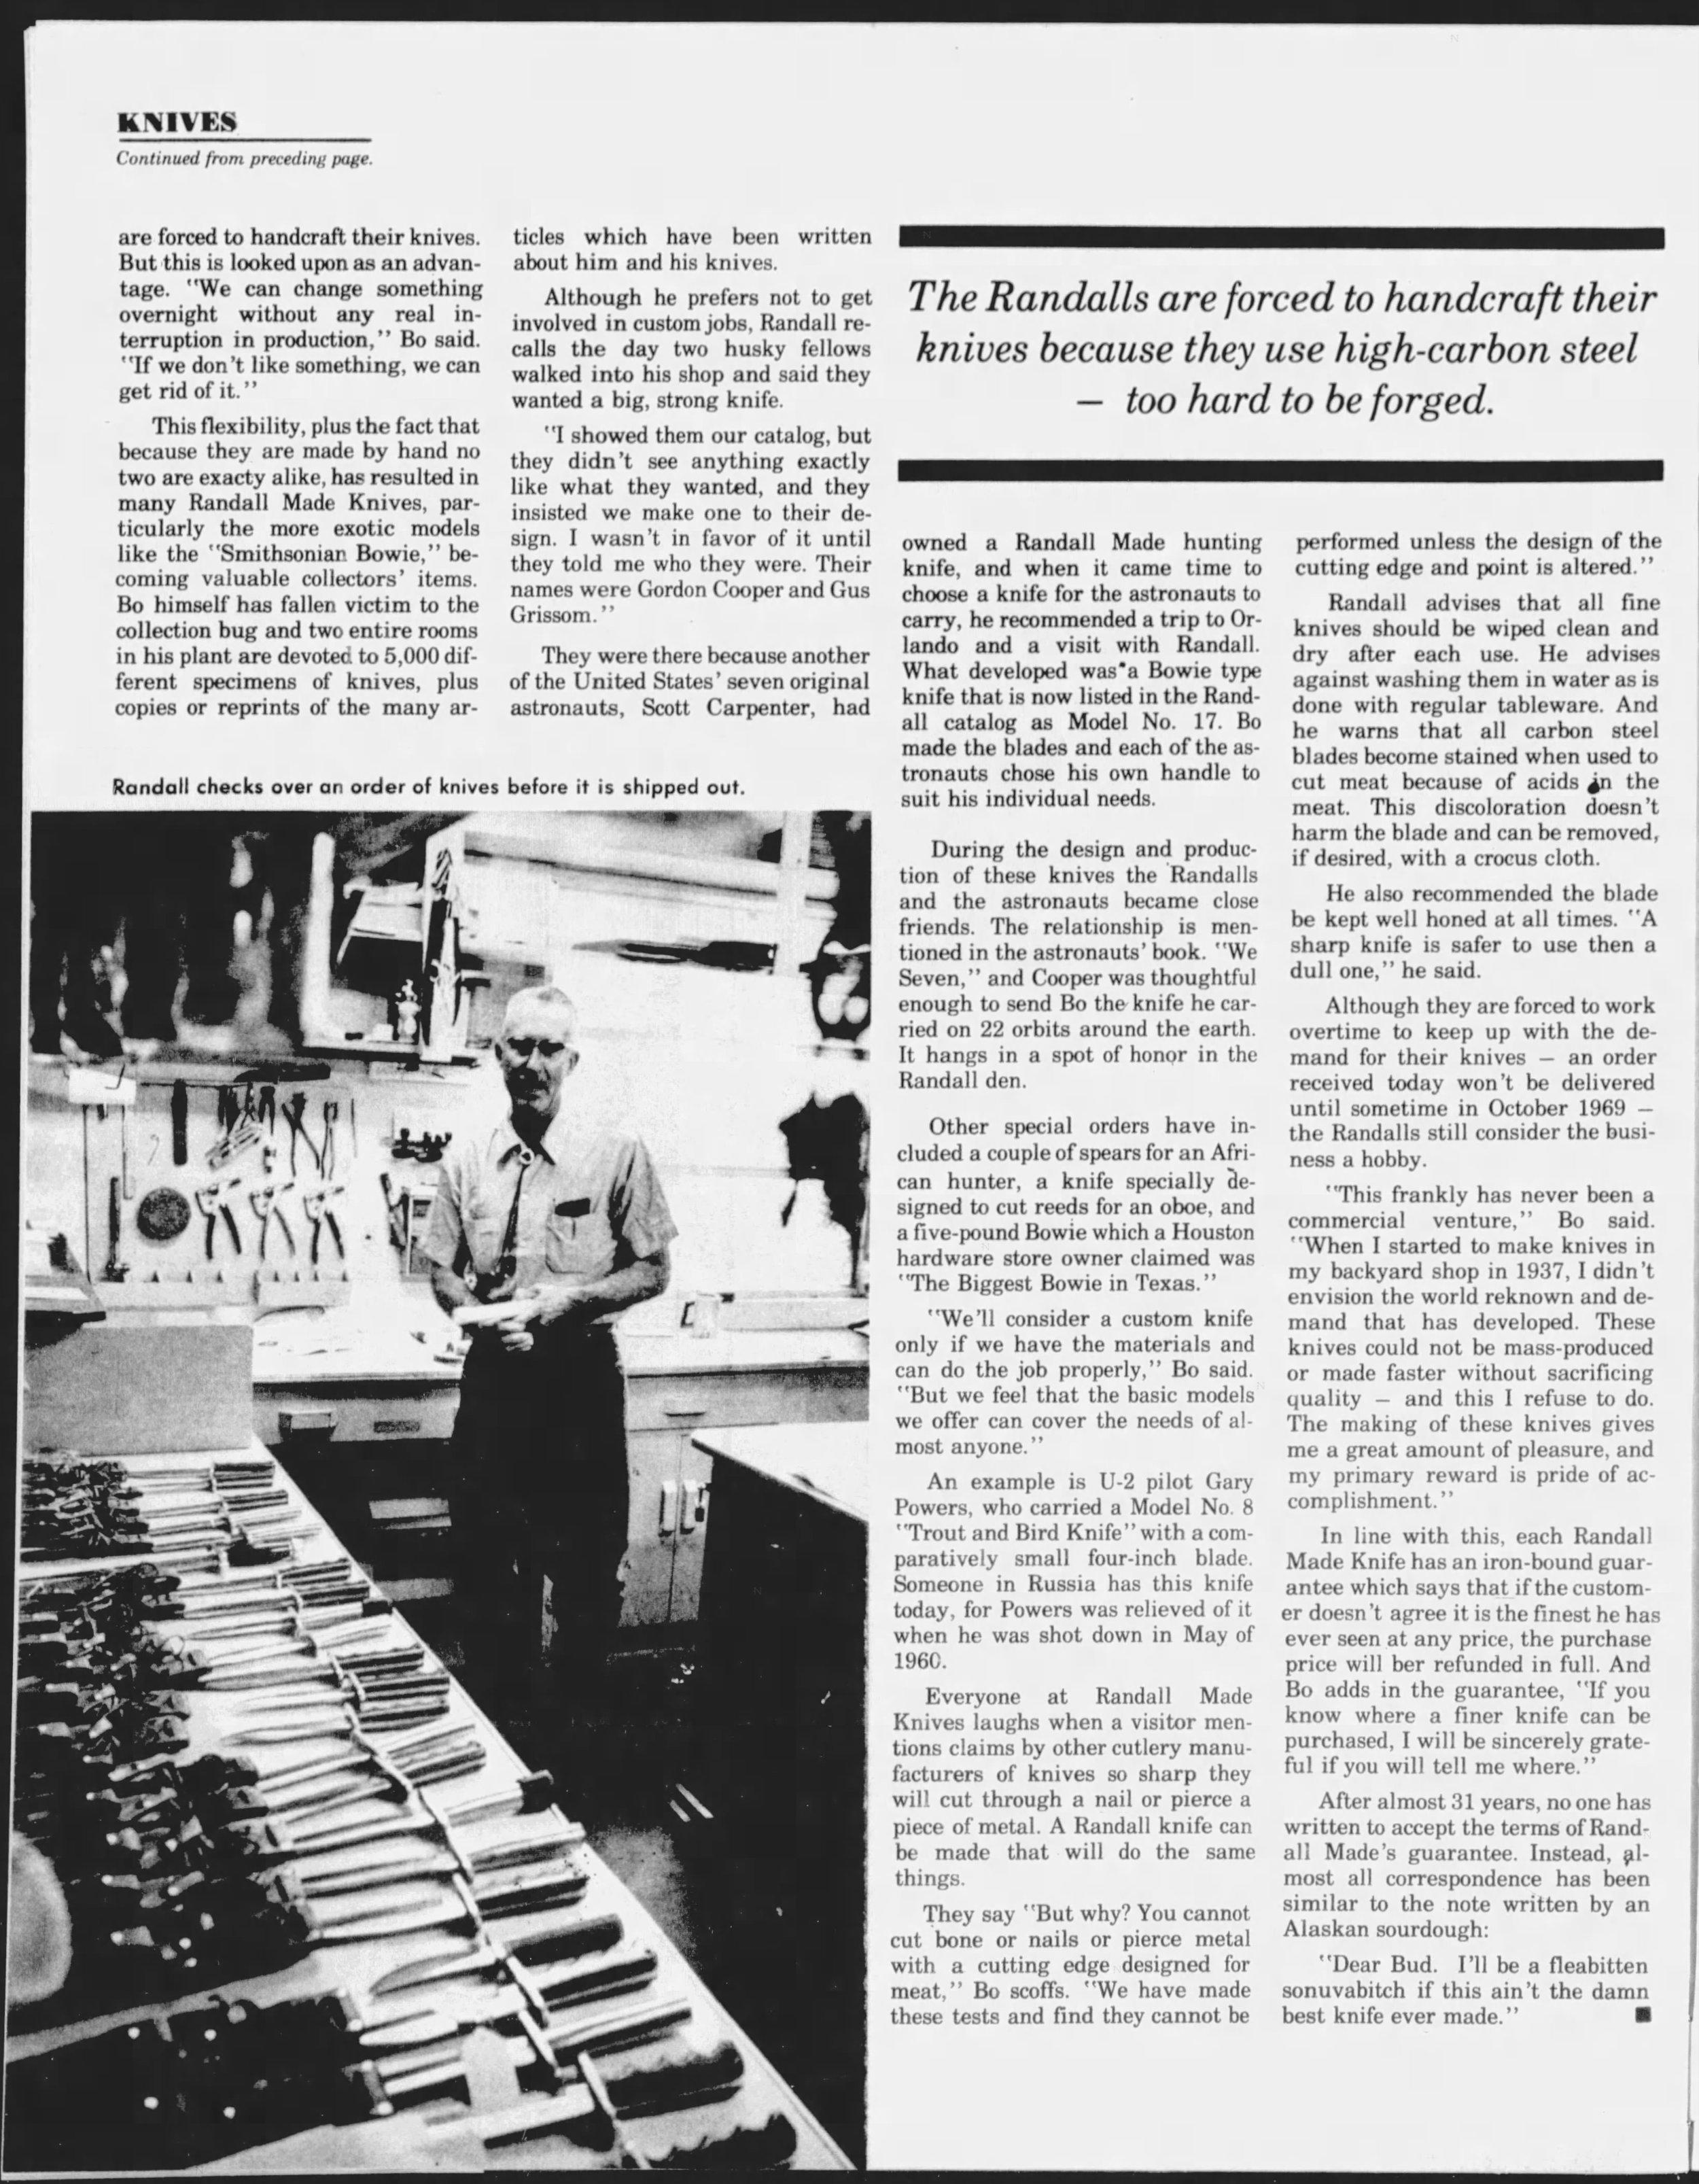 Tampa_Bay_Times_Sun__Oct_13__1968_ (3).jpg